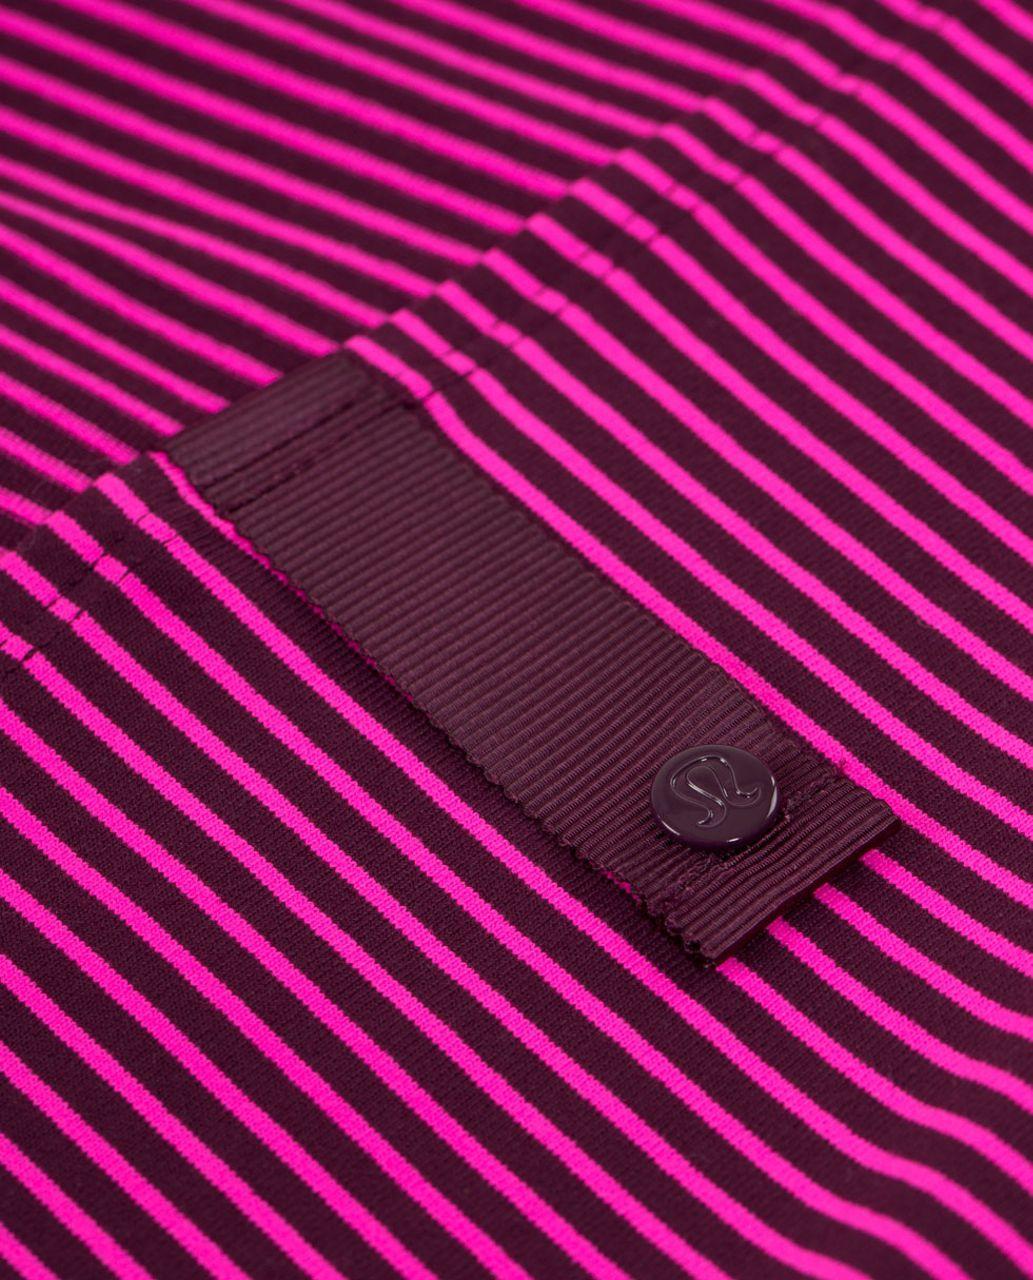 Lululemon Vinyasa Scarf *Luon Light - Hyper Stripe Raspberry Glo Light